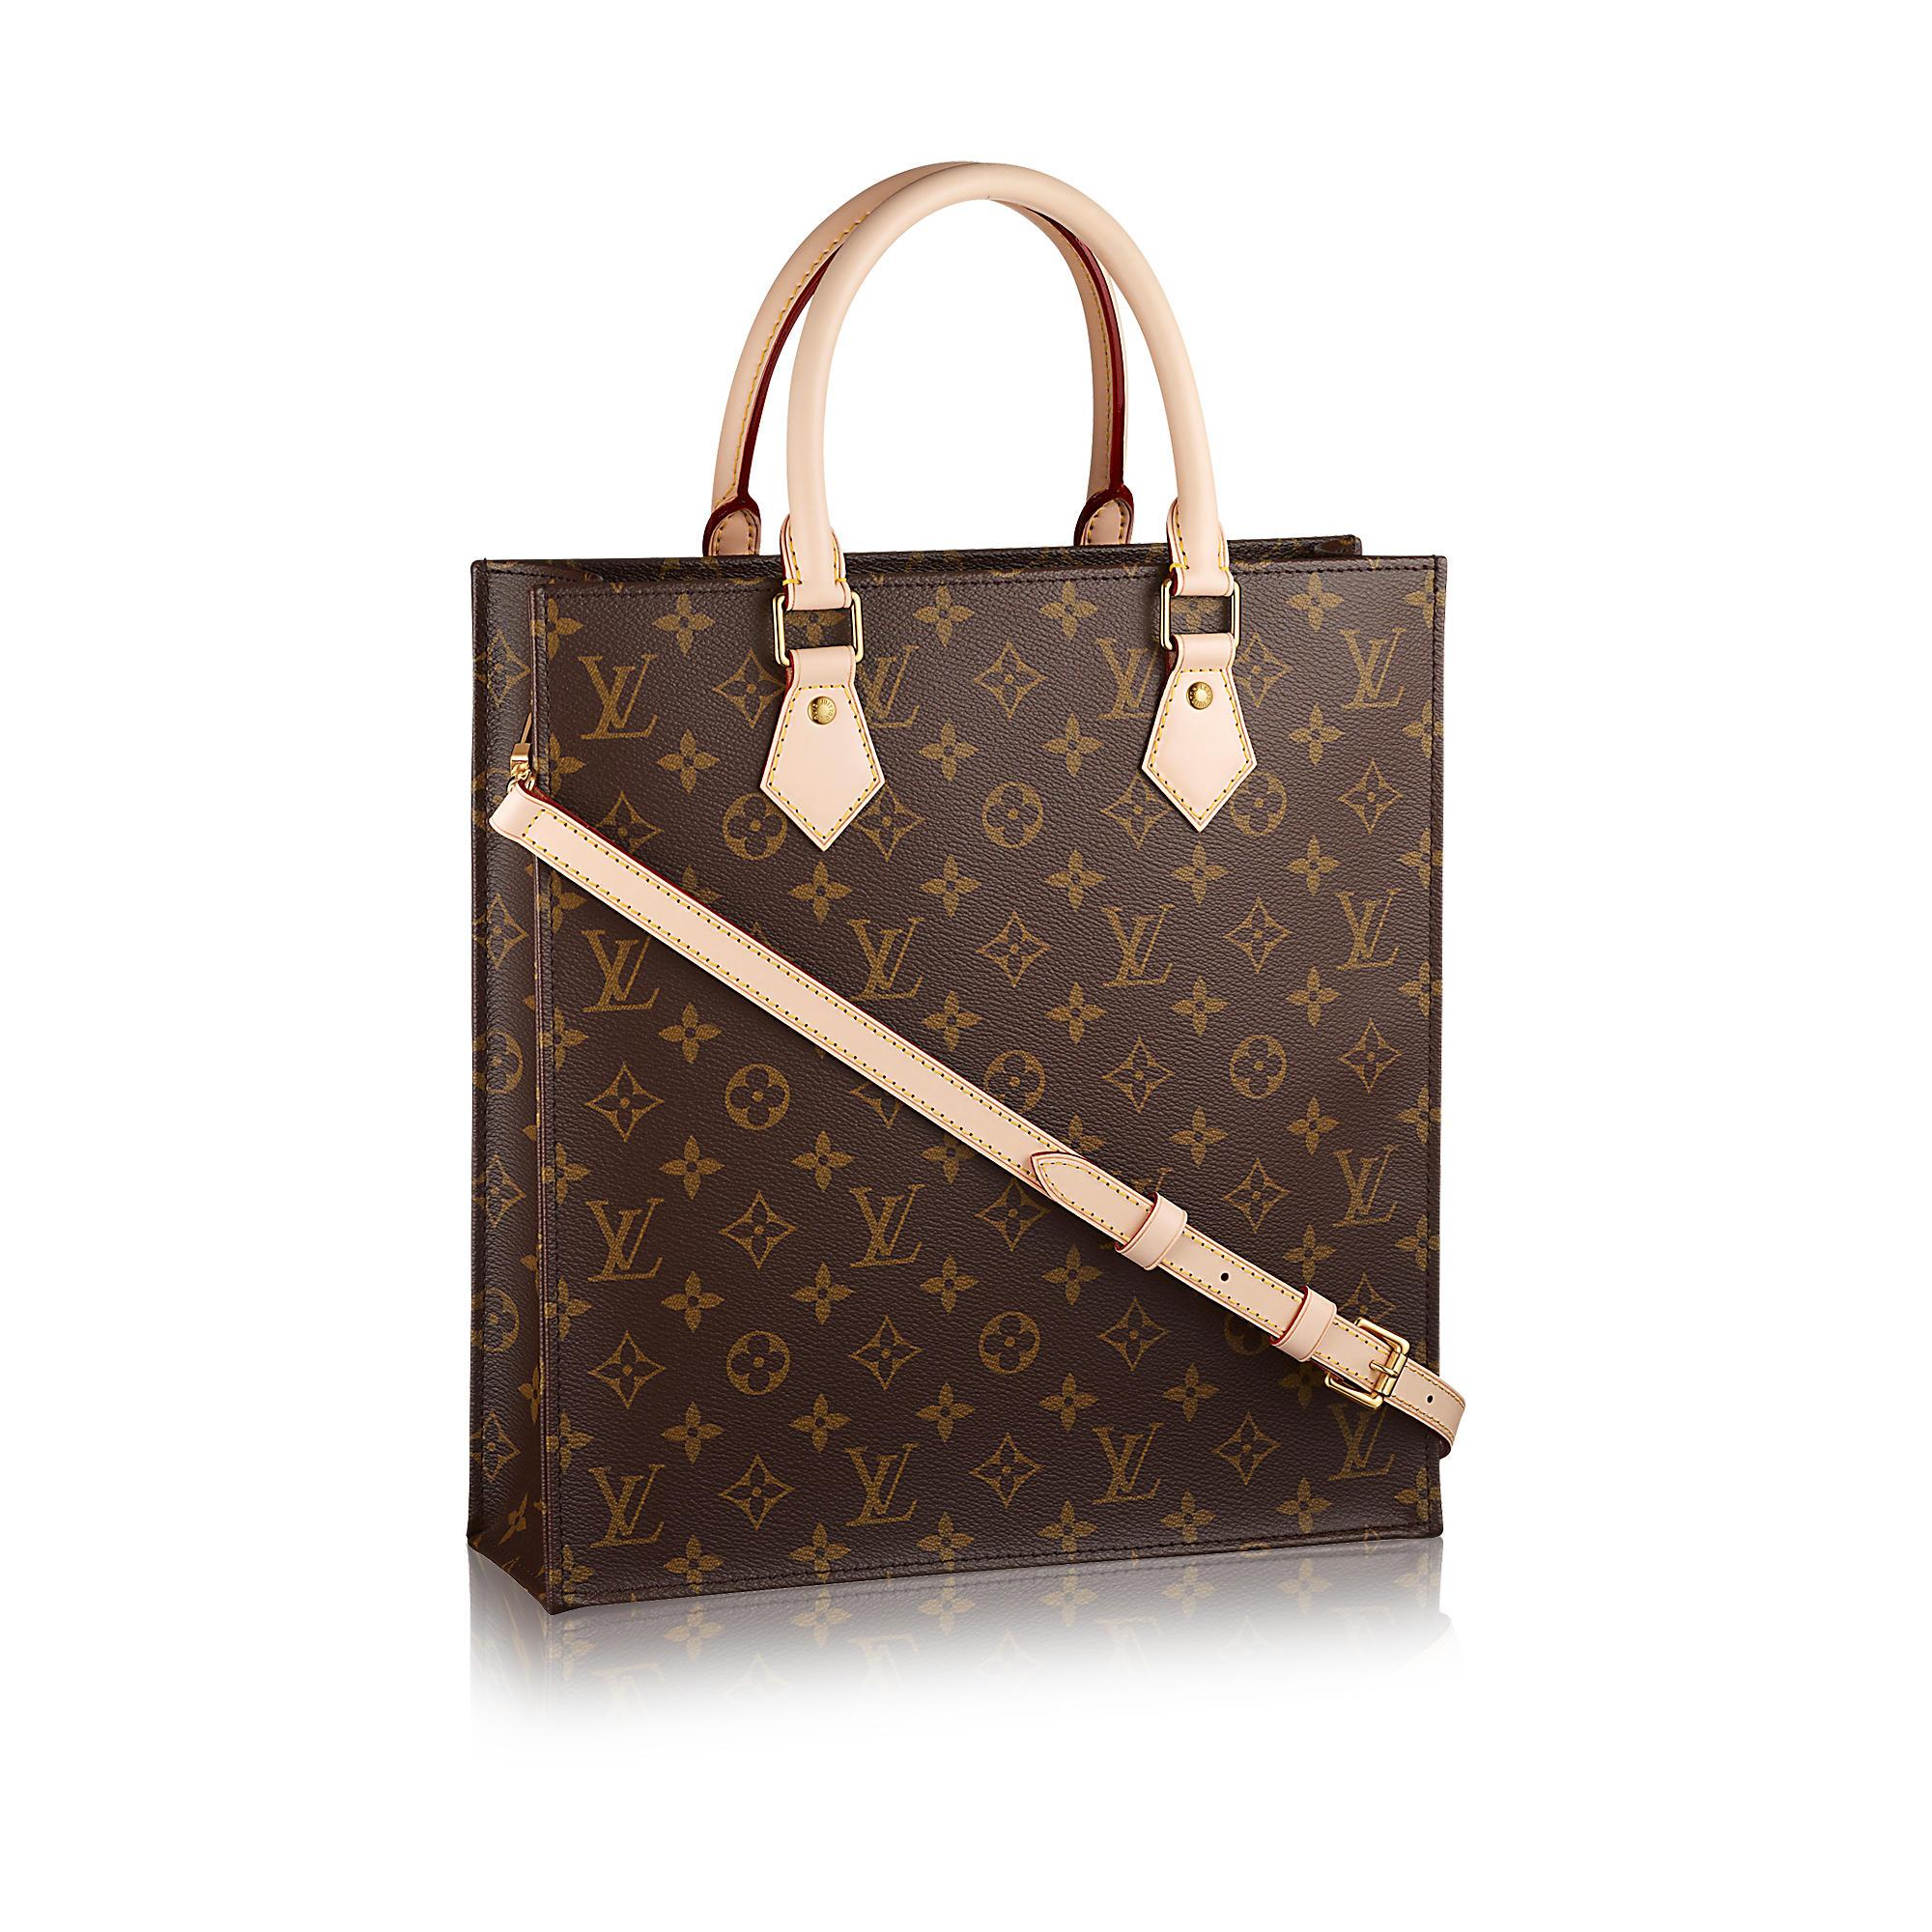 Sac Louis Vuitton Vrai : National handbag day top totes for busy women heucy